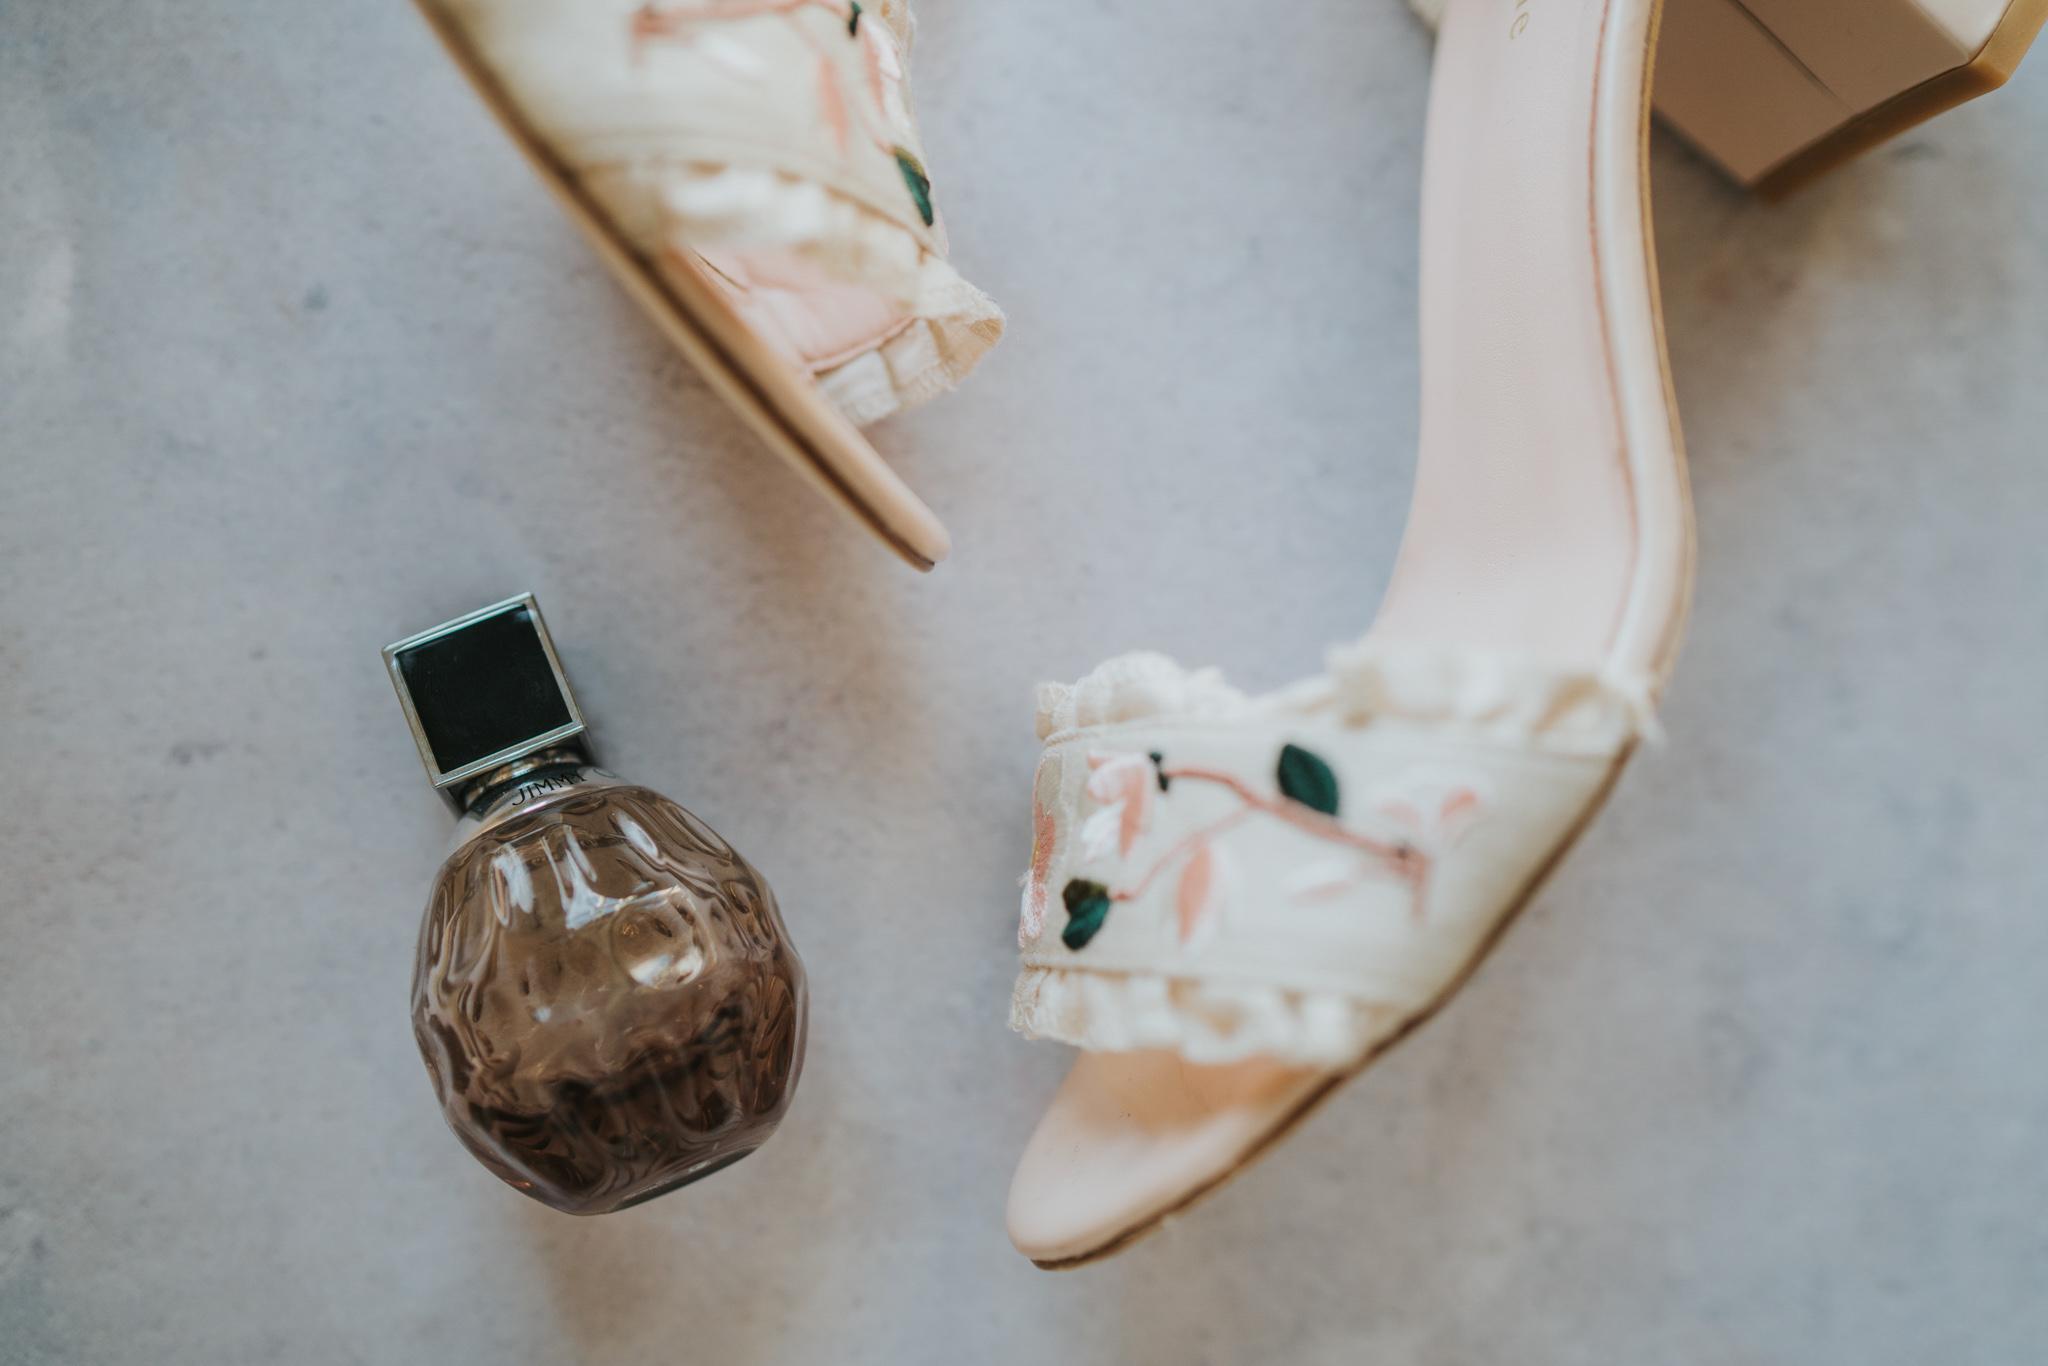 grace-sam-old-barn-clovelly-devon-wedding-photographer-grace-elizabeth-essex-suffolk-norfolk-wedding-photographer (3 of 132).jpg